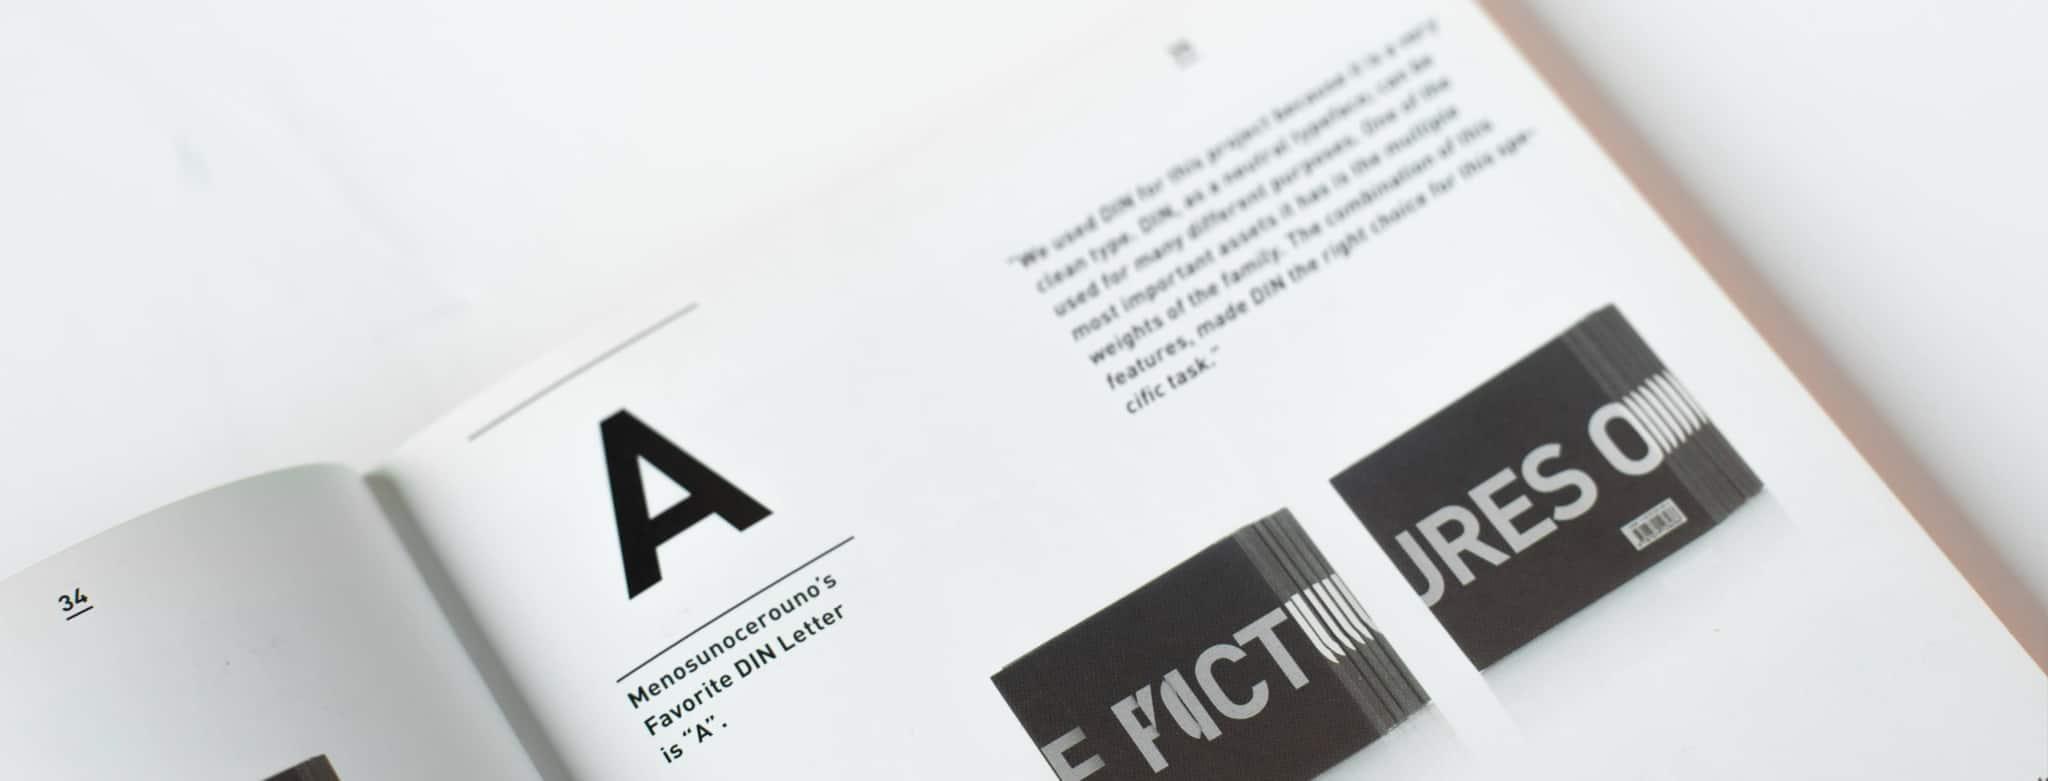 Magazin Typografie